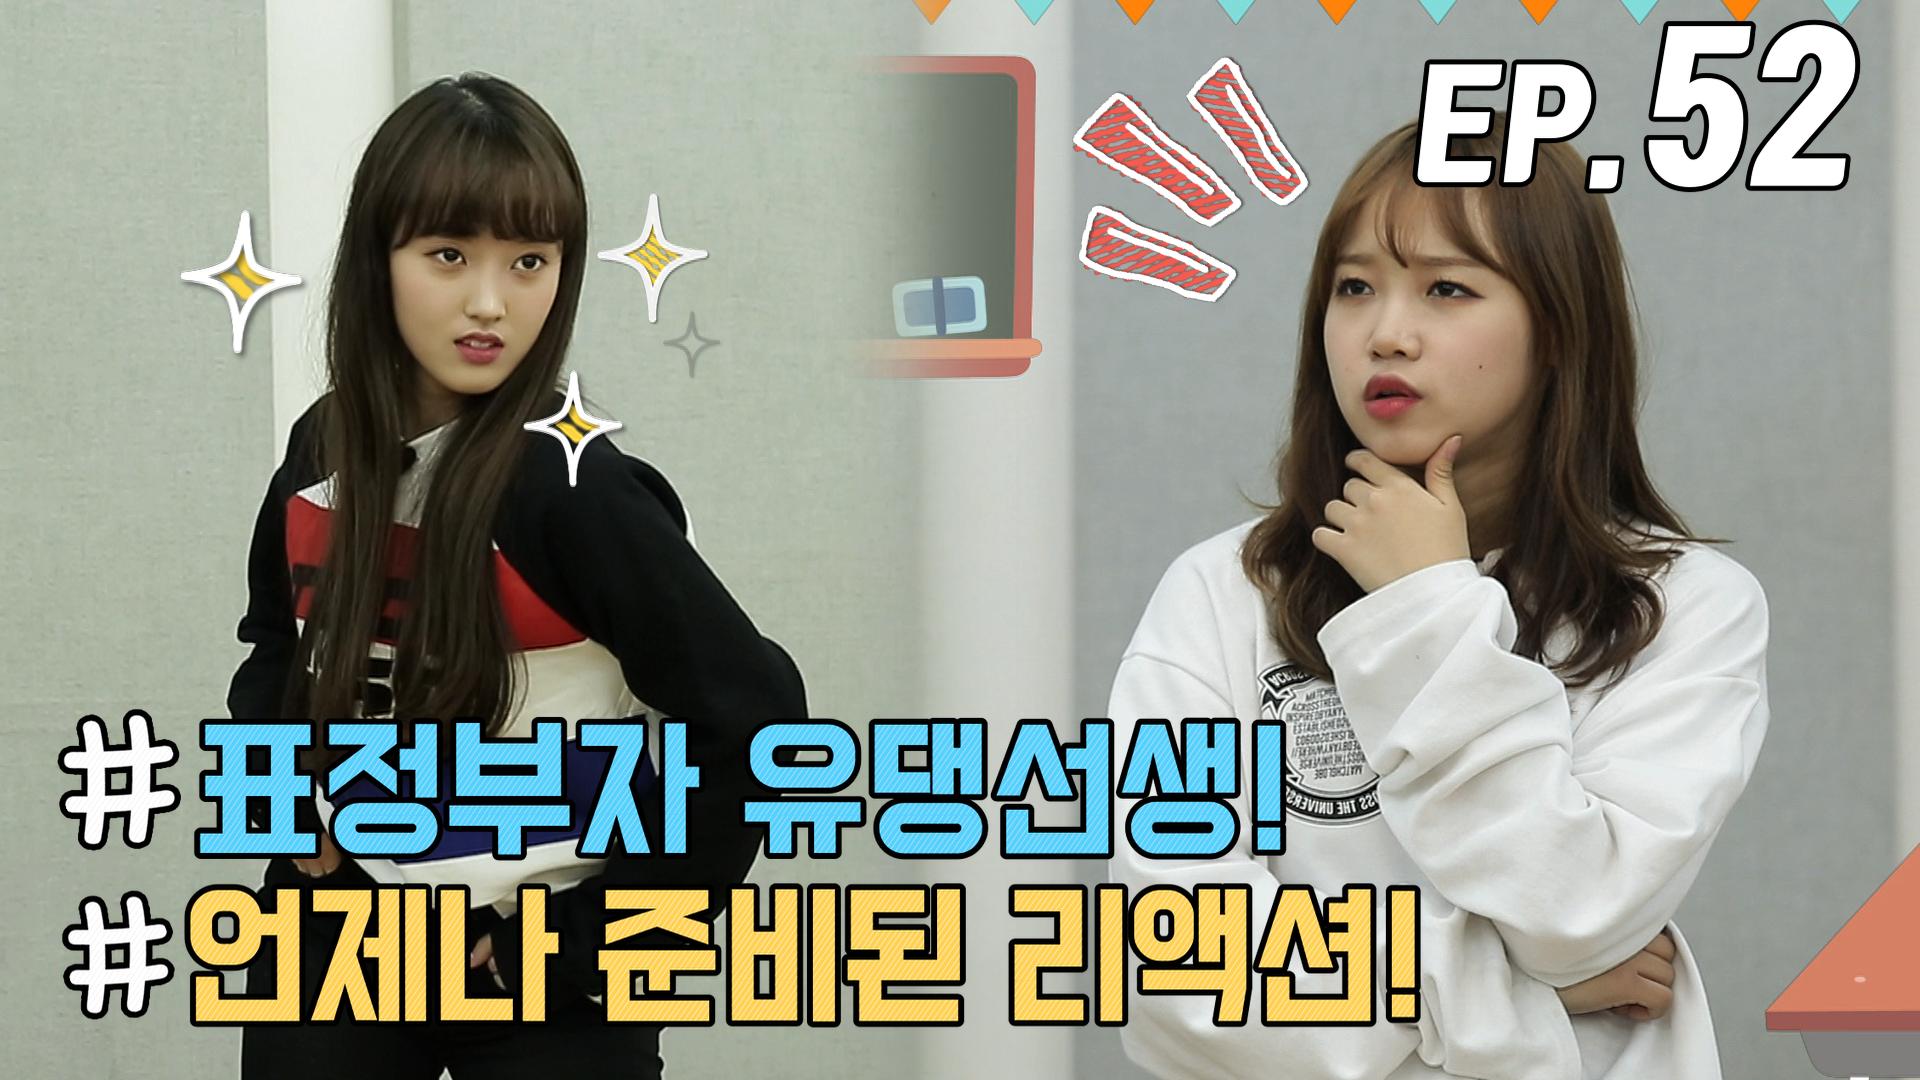 [WekiMeki 위키미키 모해?] EP52 윜밐 예능대회 리액션 교실